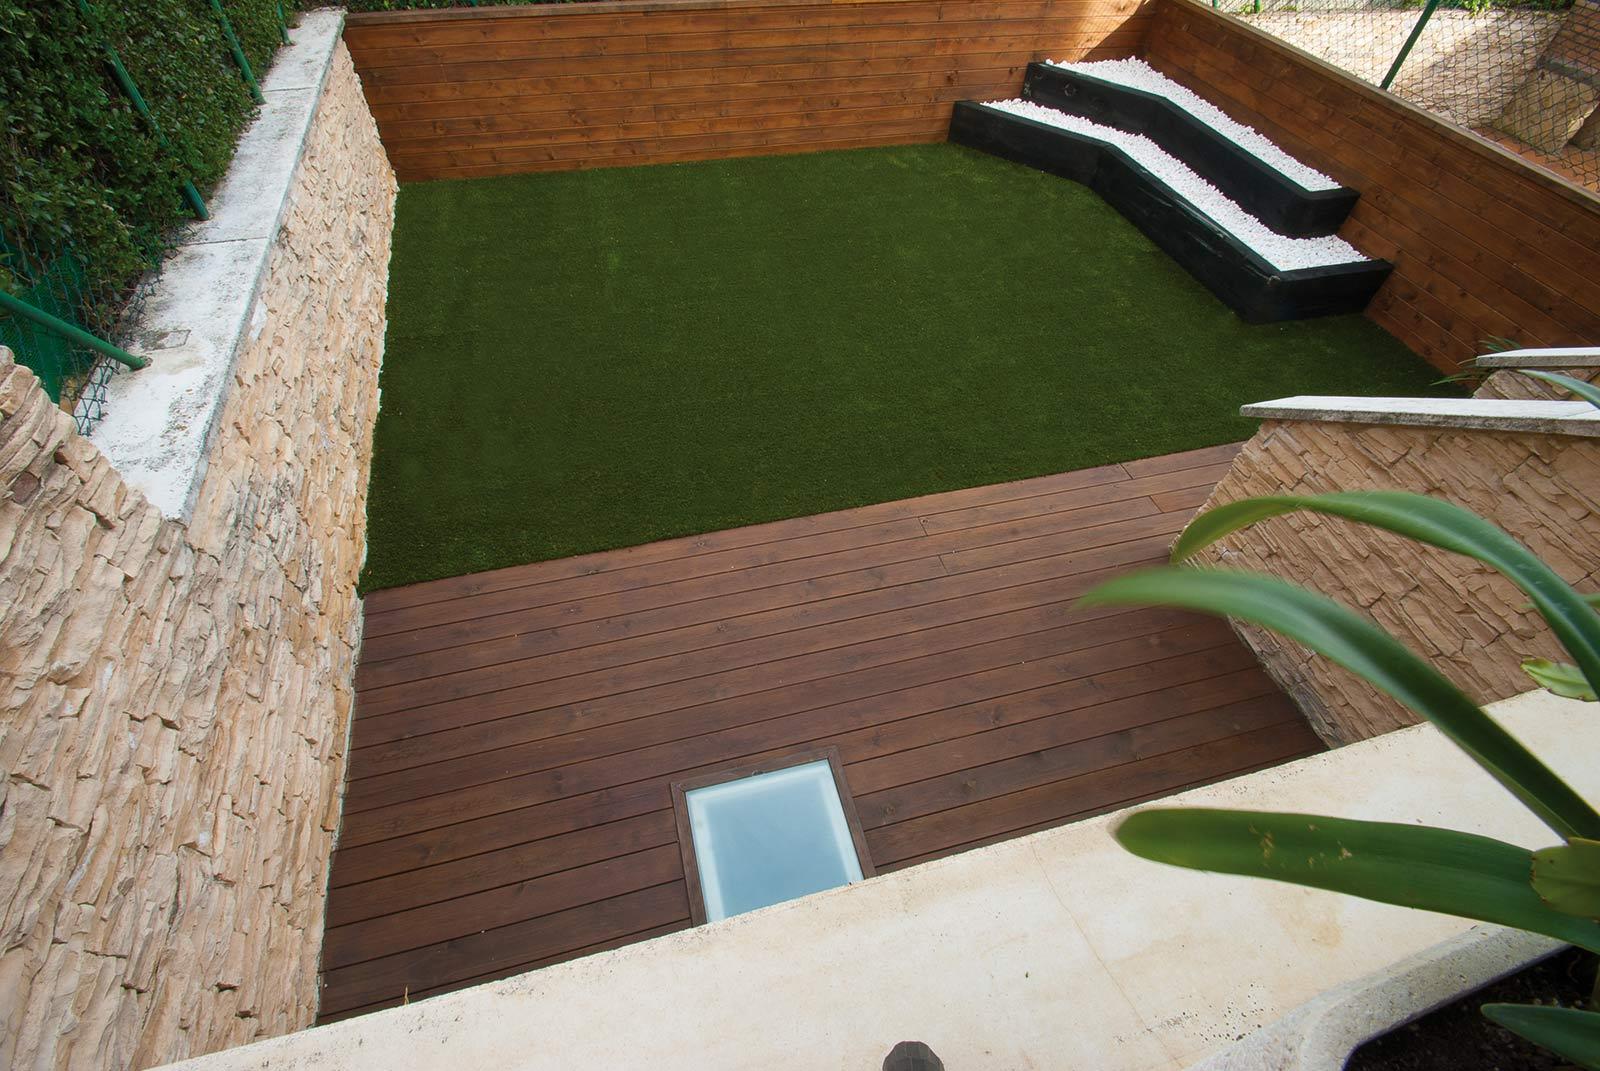 jardin-cespe-artificial-tarima-traviesas-1